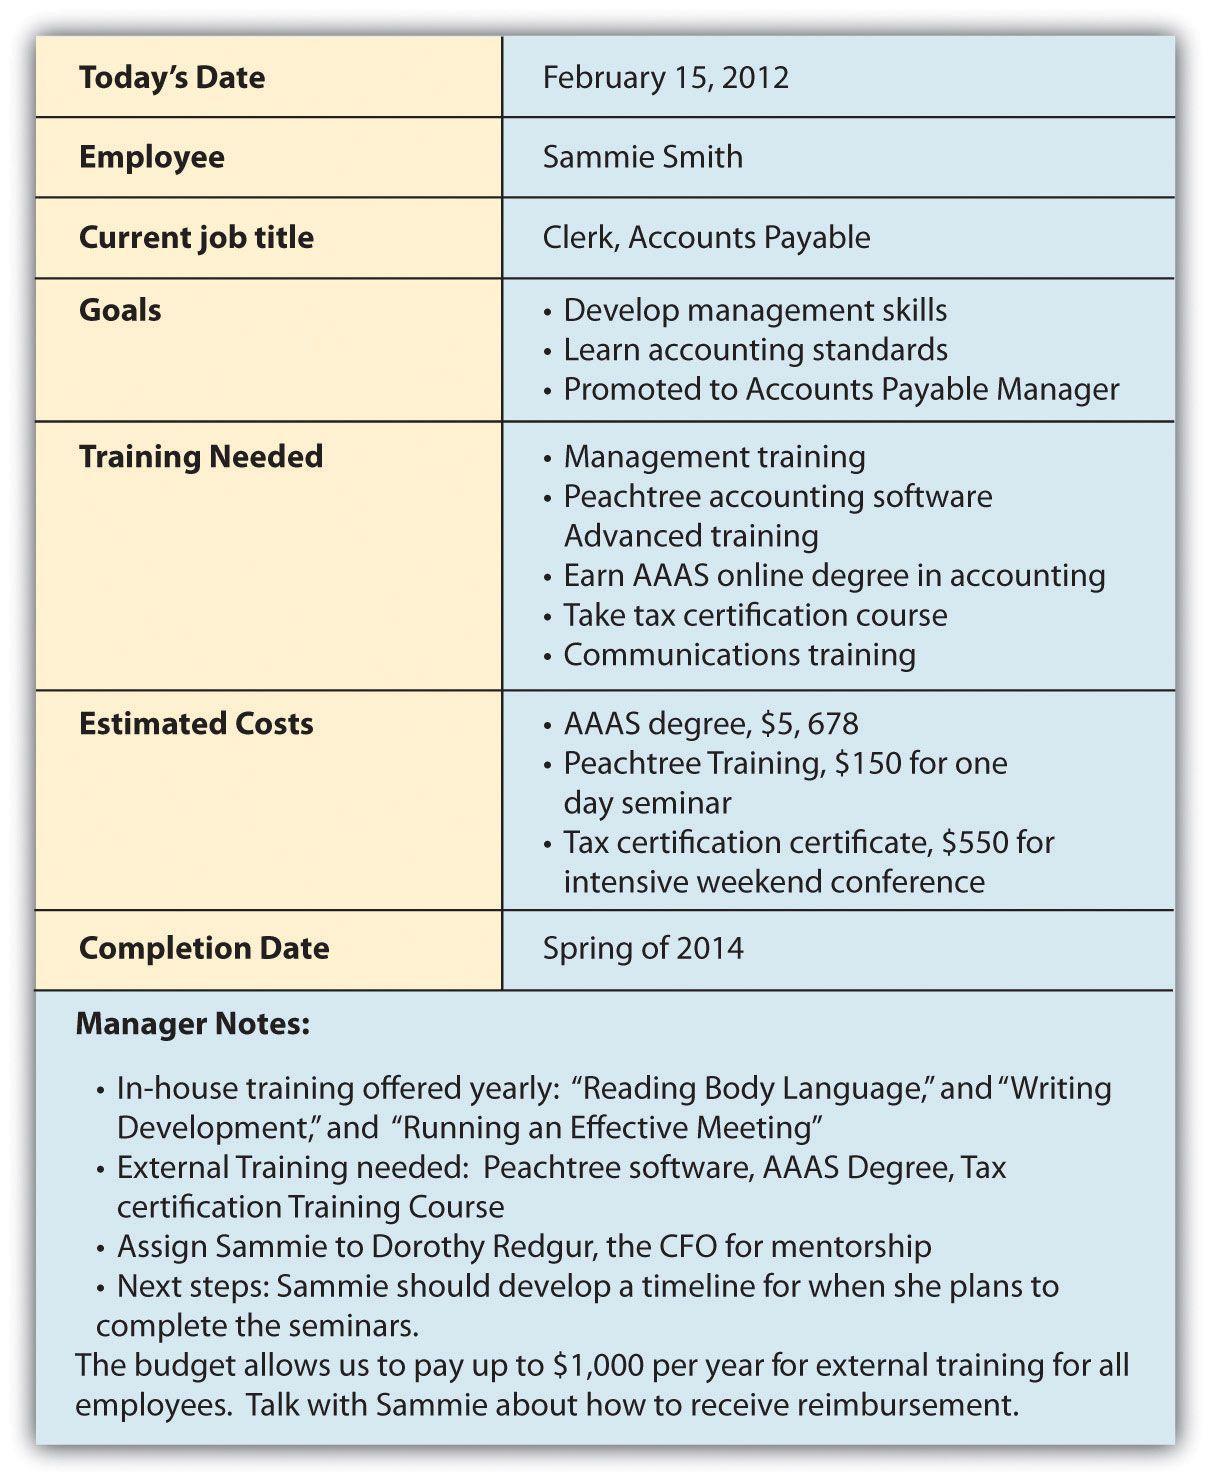 002 Wonderful Employee Development Plan Template Highest Clarity  Ppt FreeFull